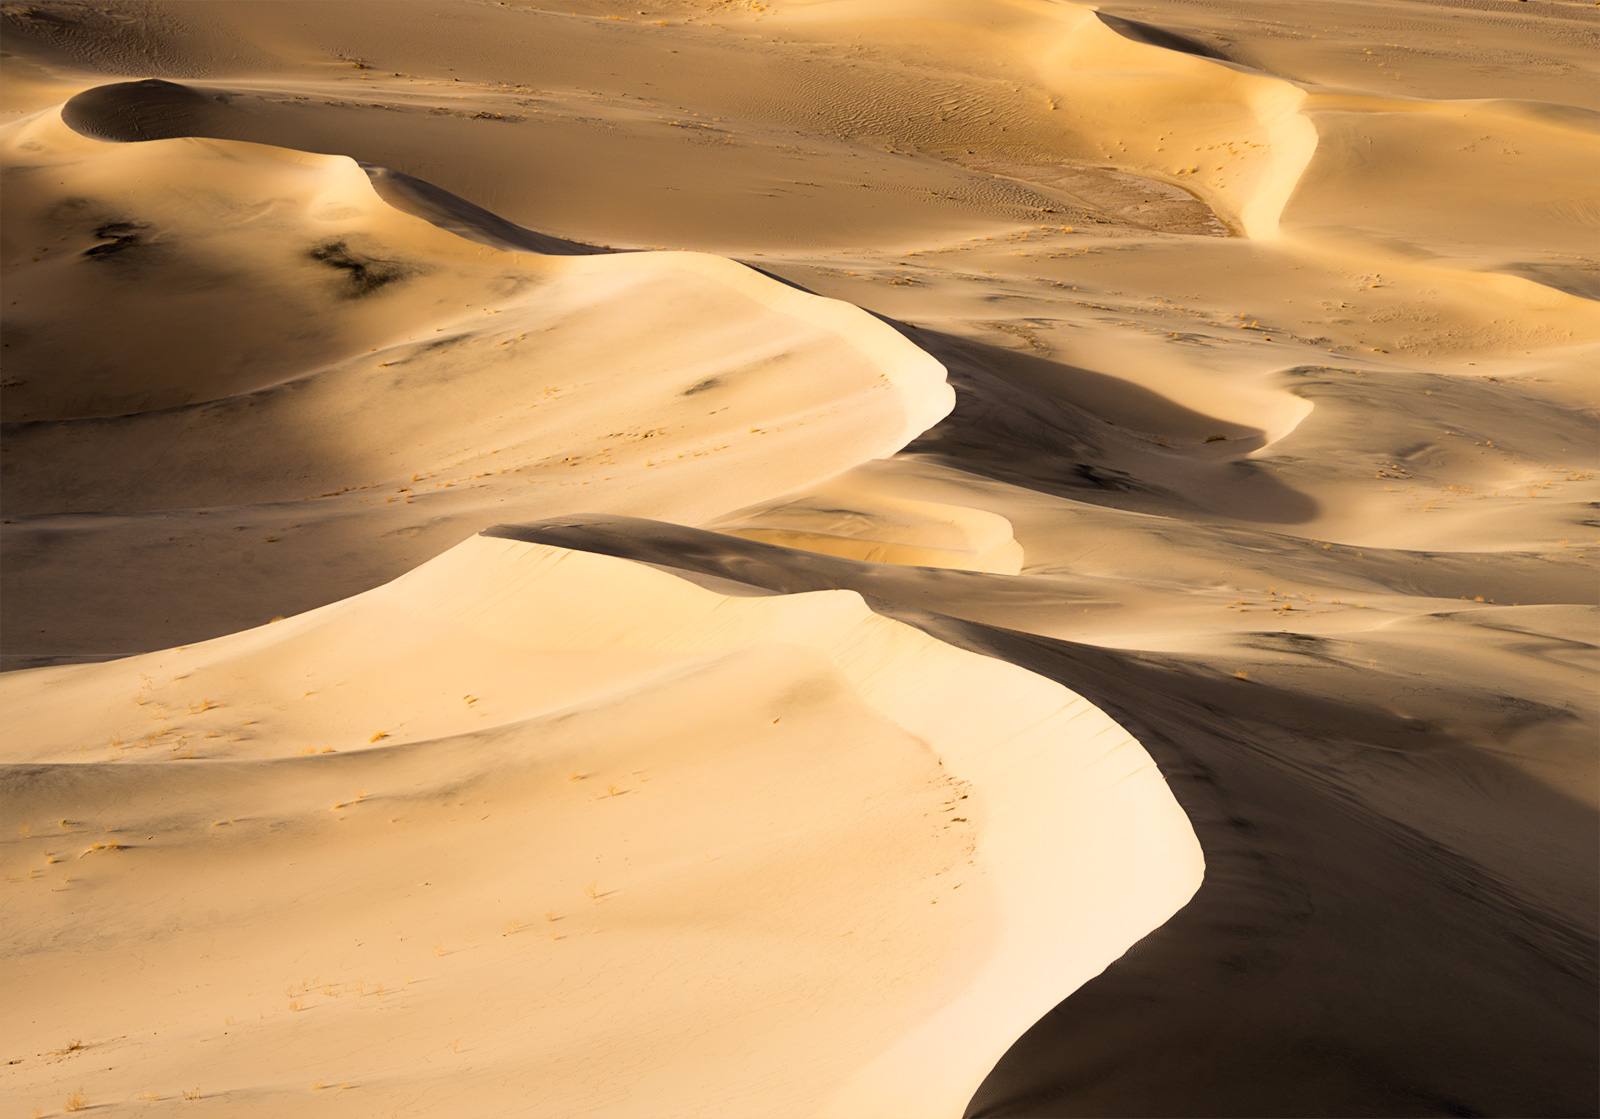 Eureka Shadows -Some shadow interplay at Eureka Valley, Death Valley.